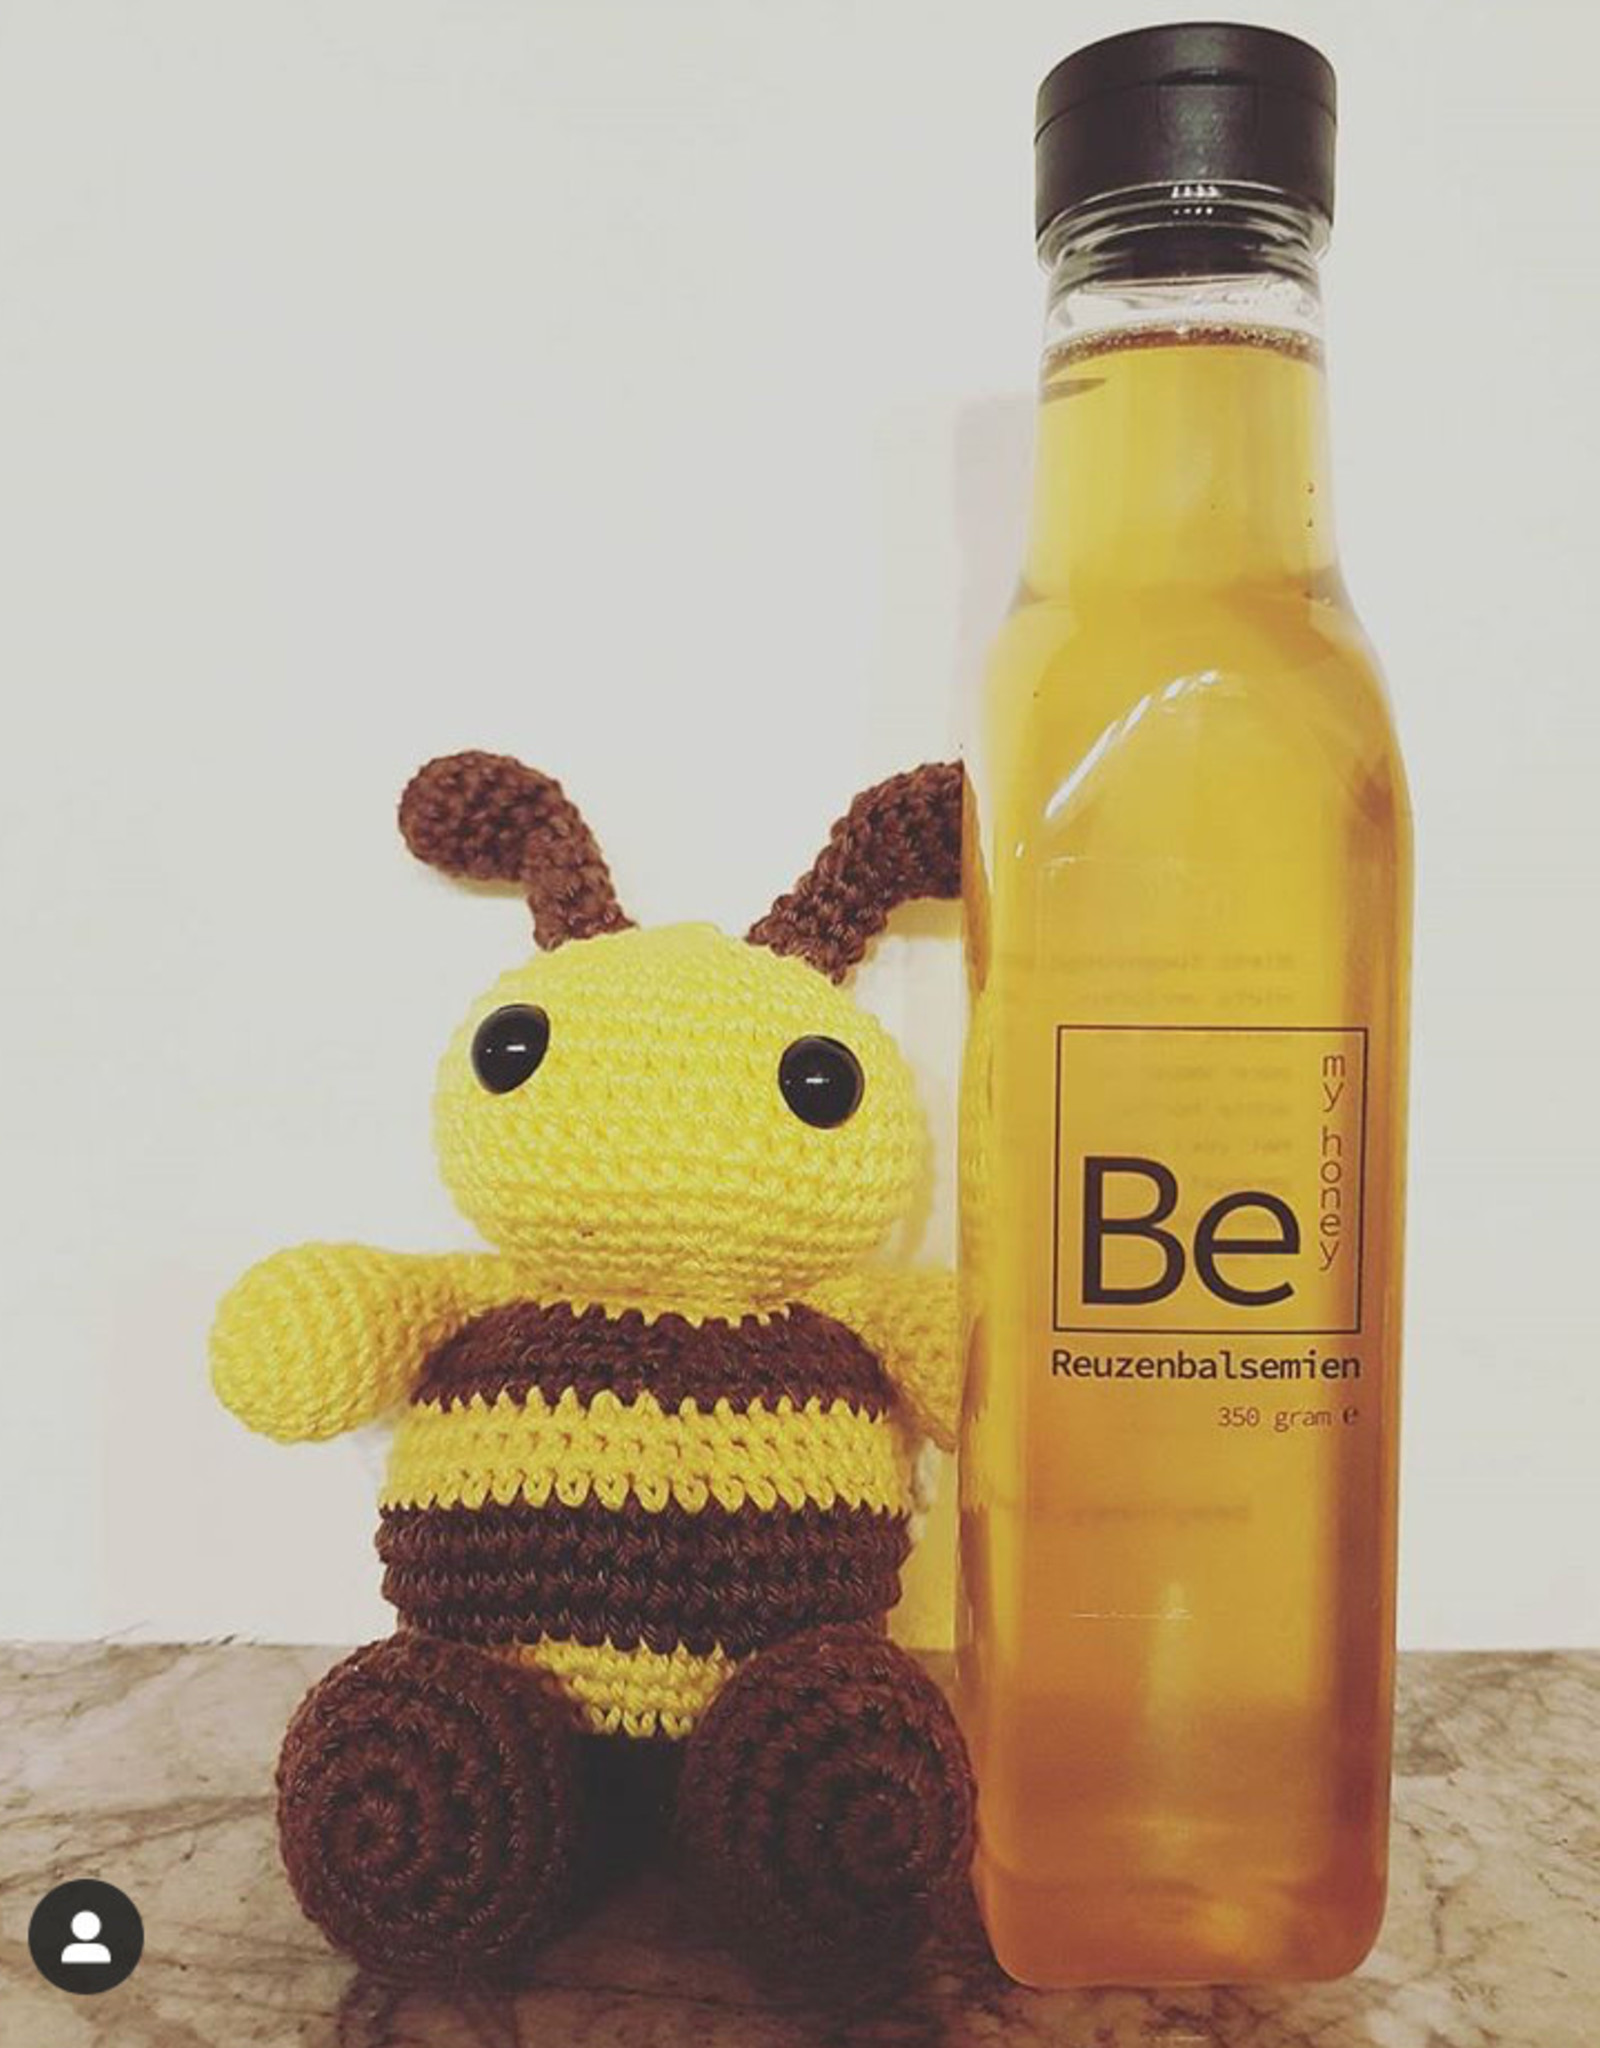 Be my honey Be my honey vloeibaar reuzenbalsemien fles 350 gr